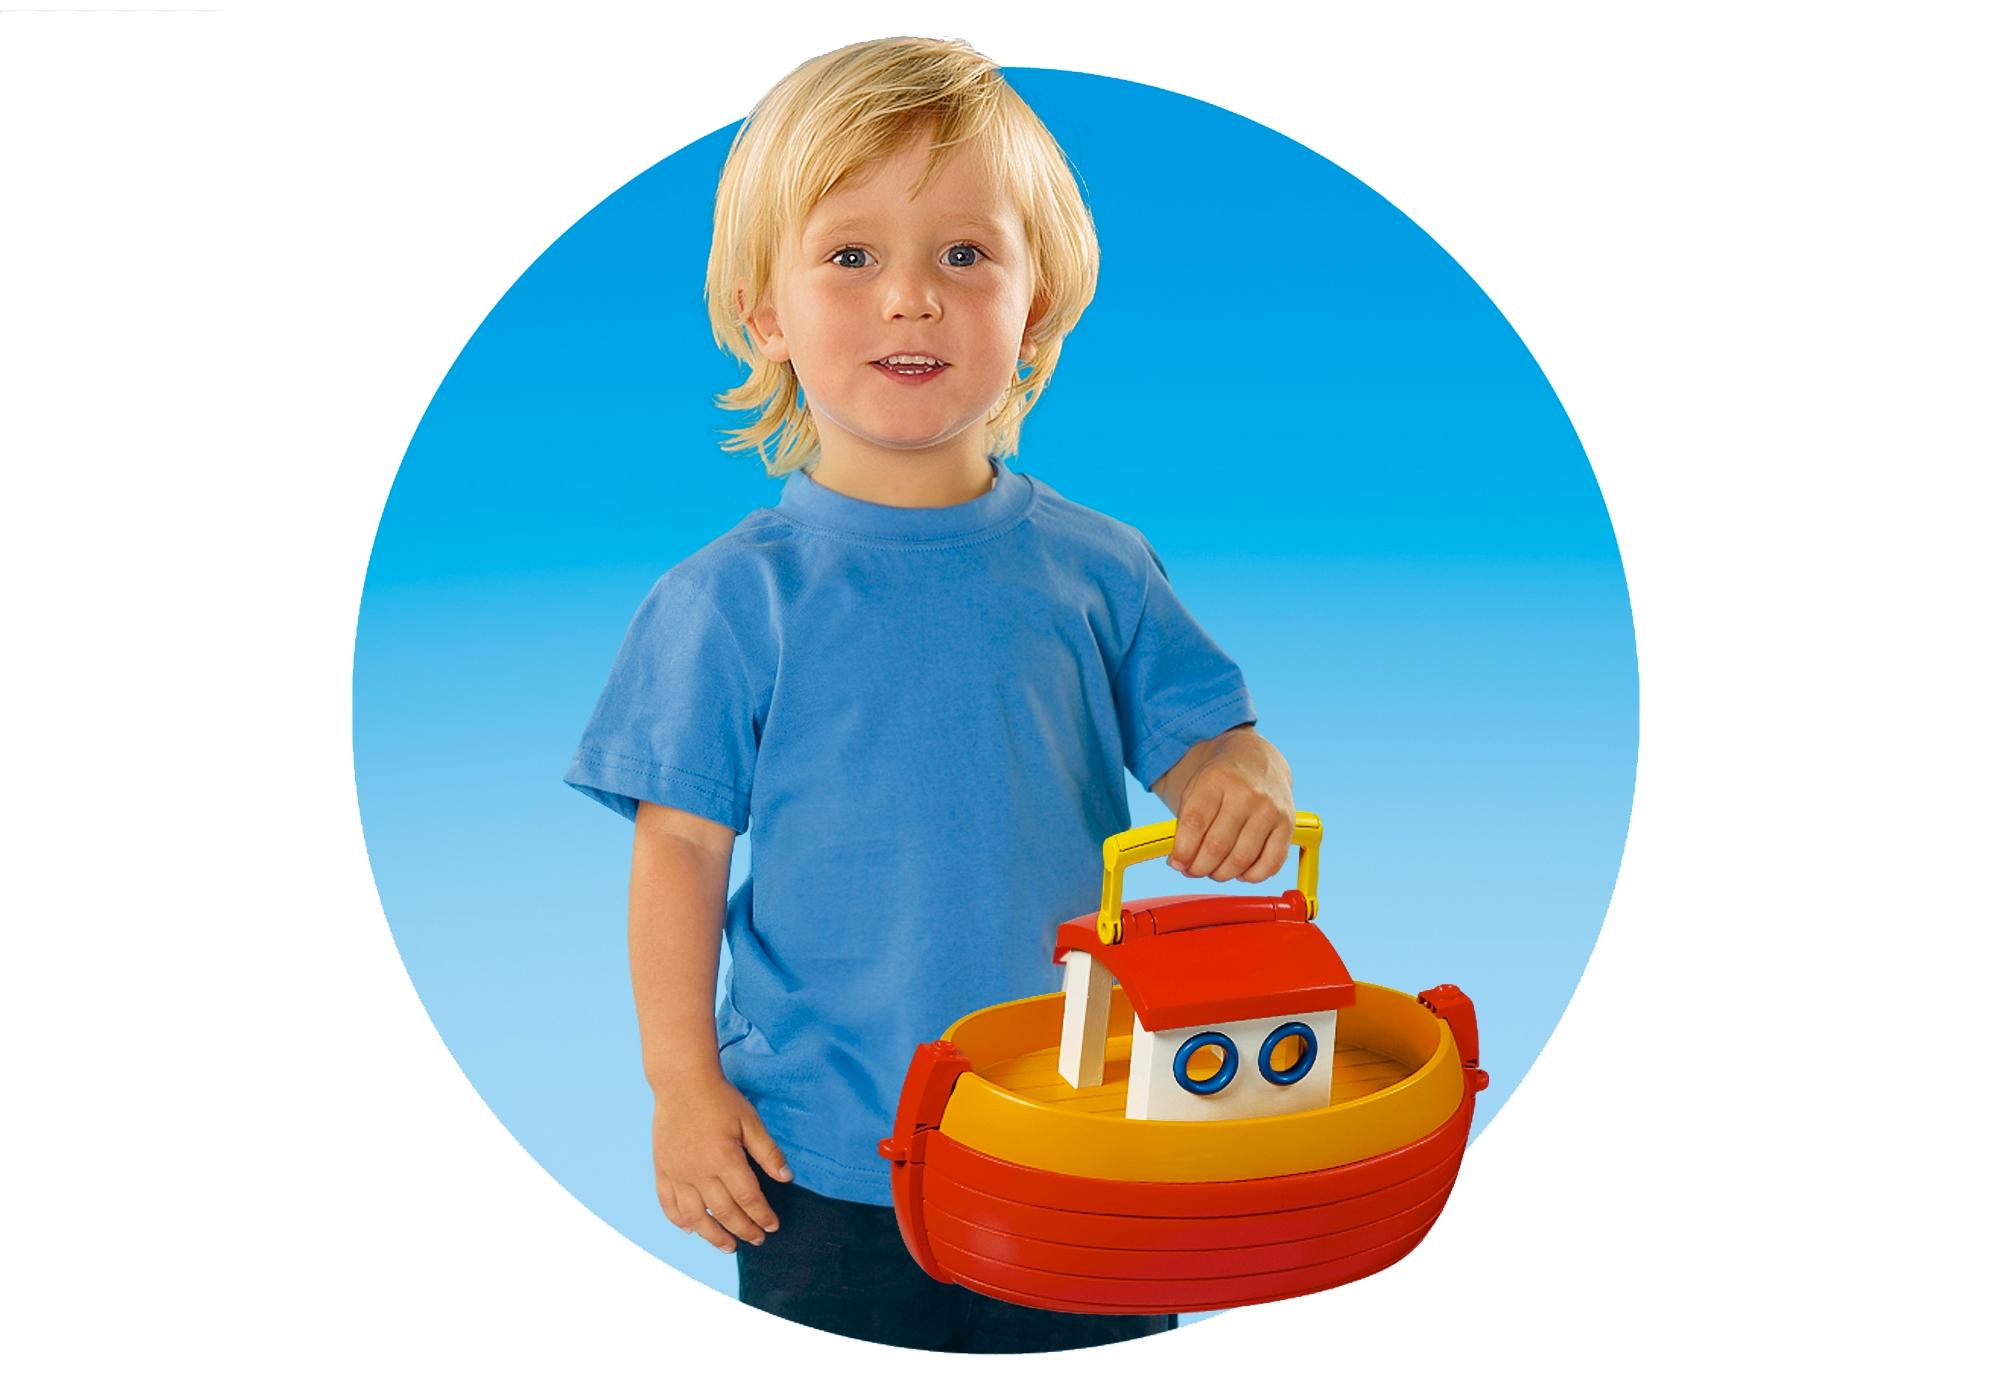 http://media.playmobil.com/i/playmobil/6765_product_extra2/Meine Mitnehm-Arche Noah